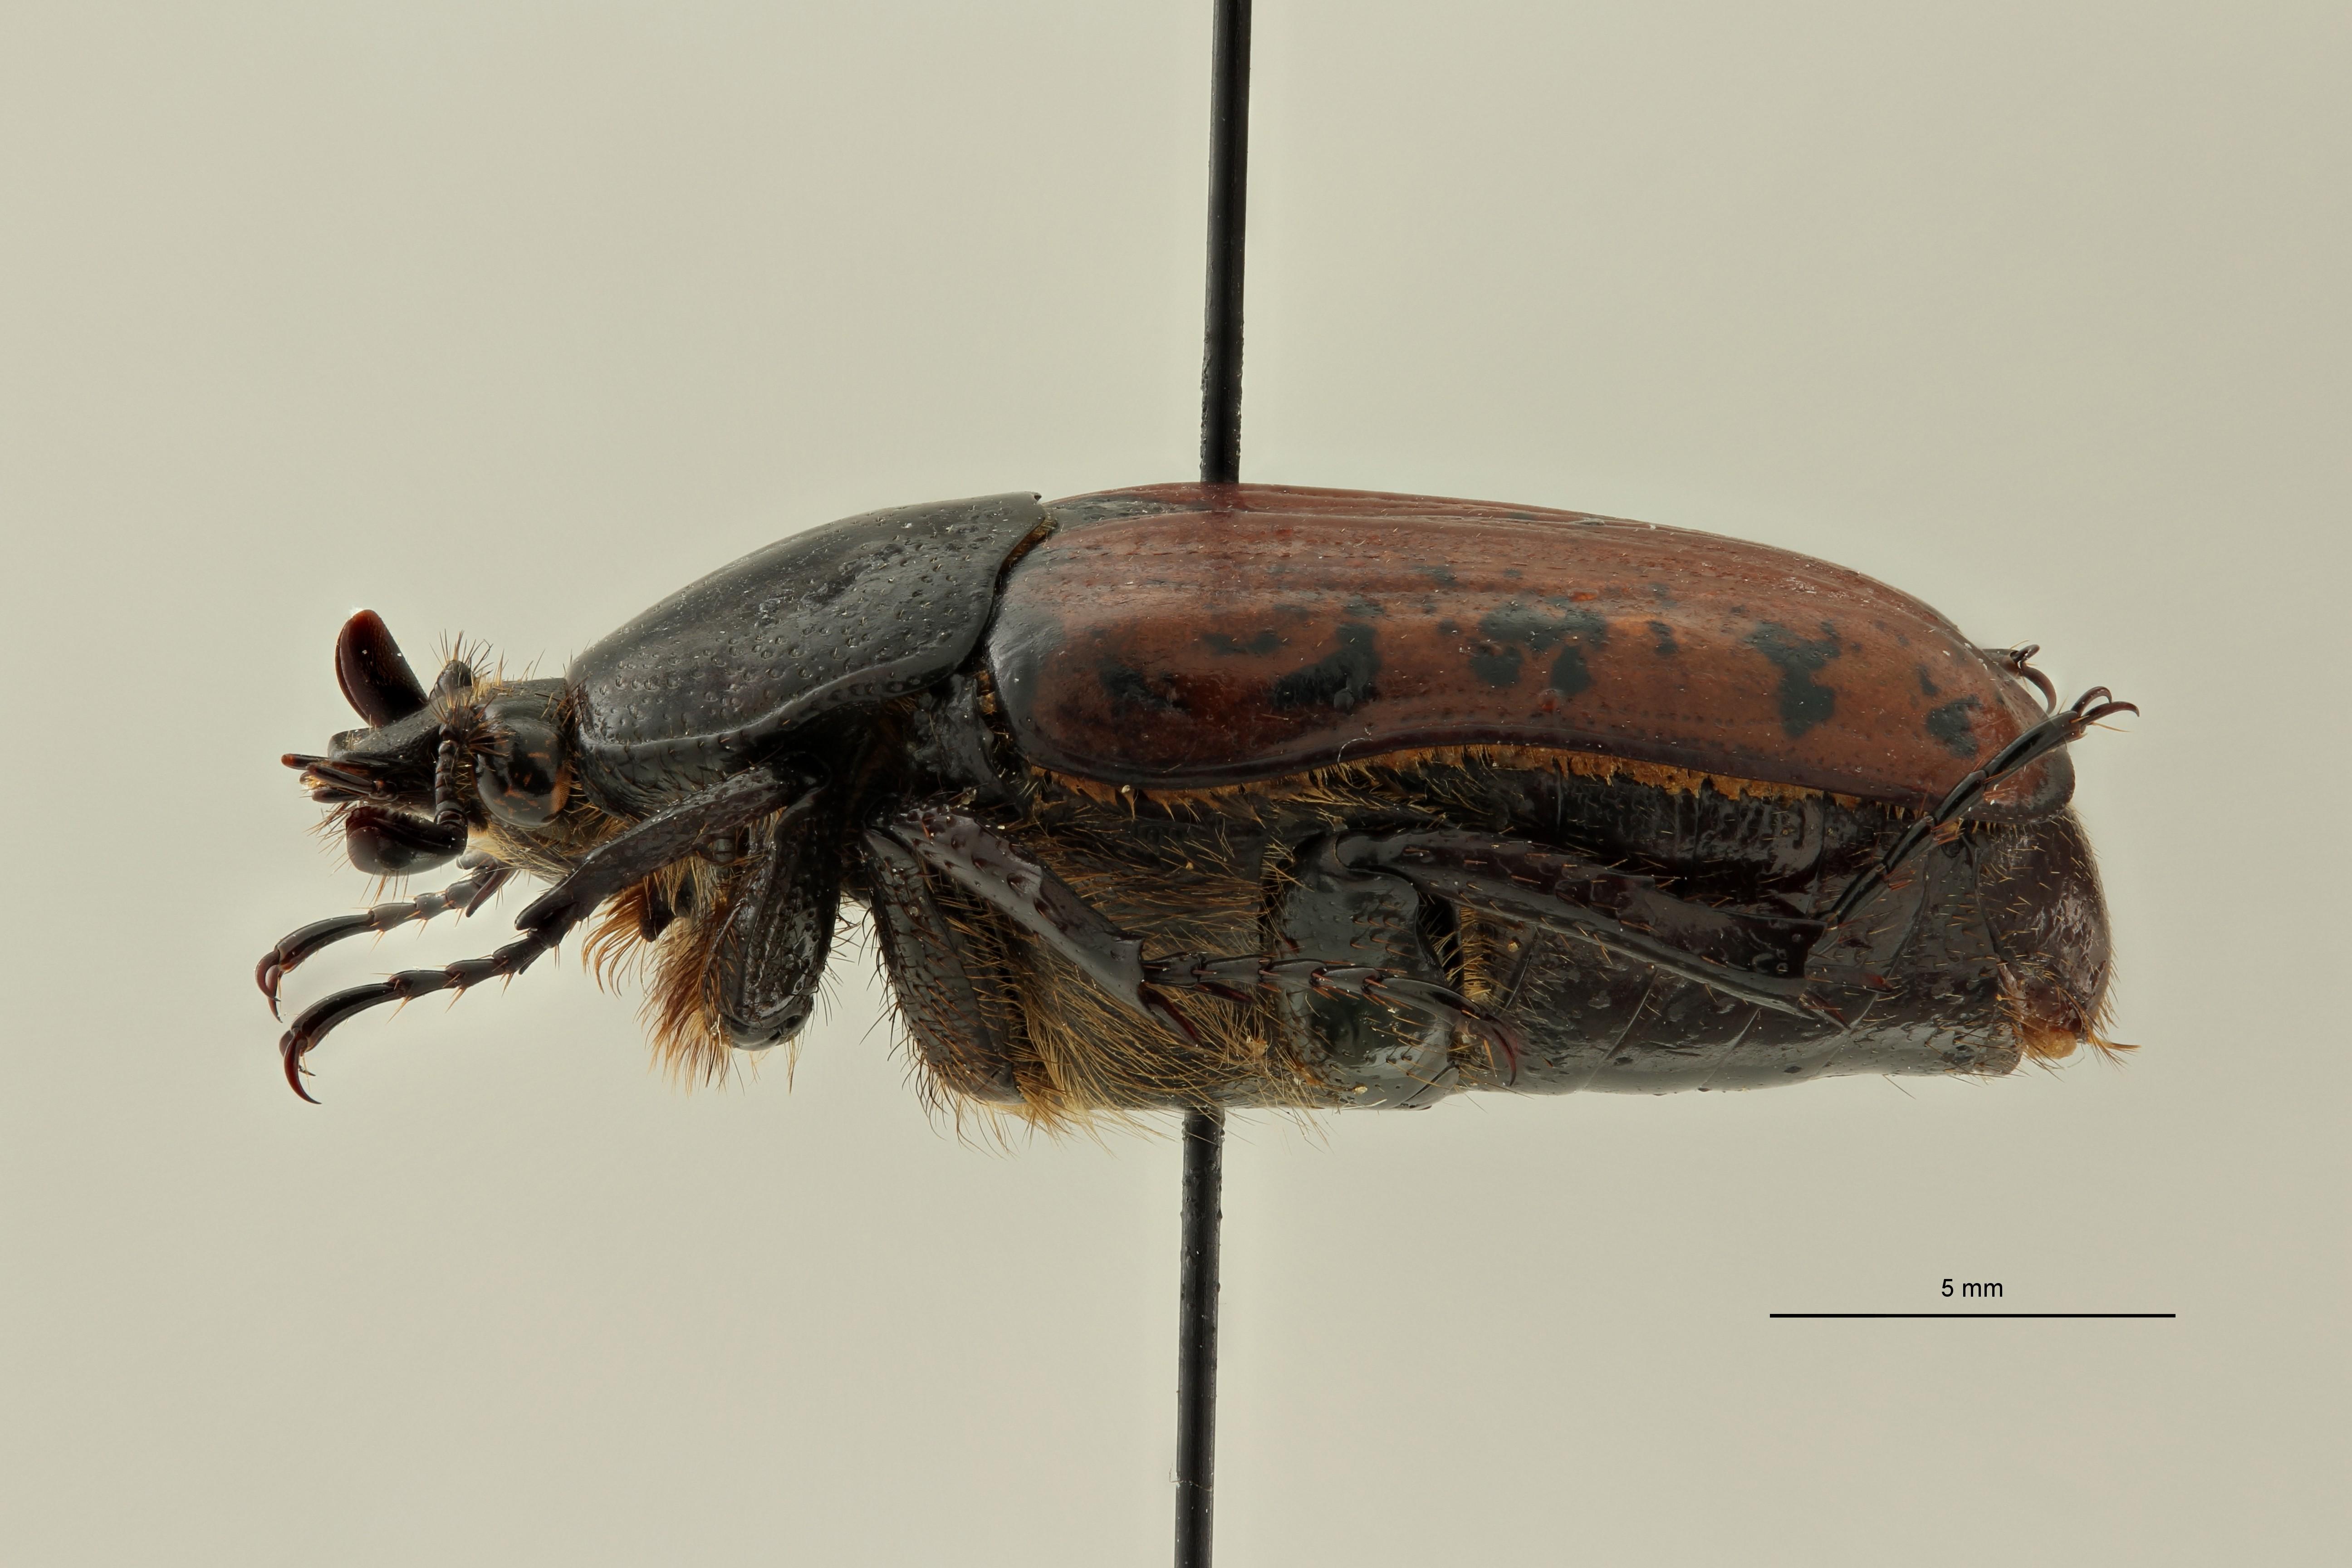 Centrantyx (Nigrocentrantyx) digennaroi mickaeli at L ZS PMax Scaled.jpeg